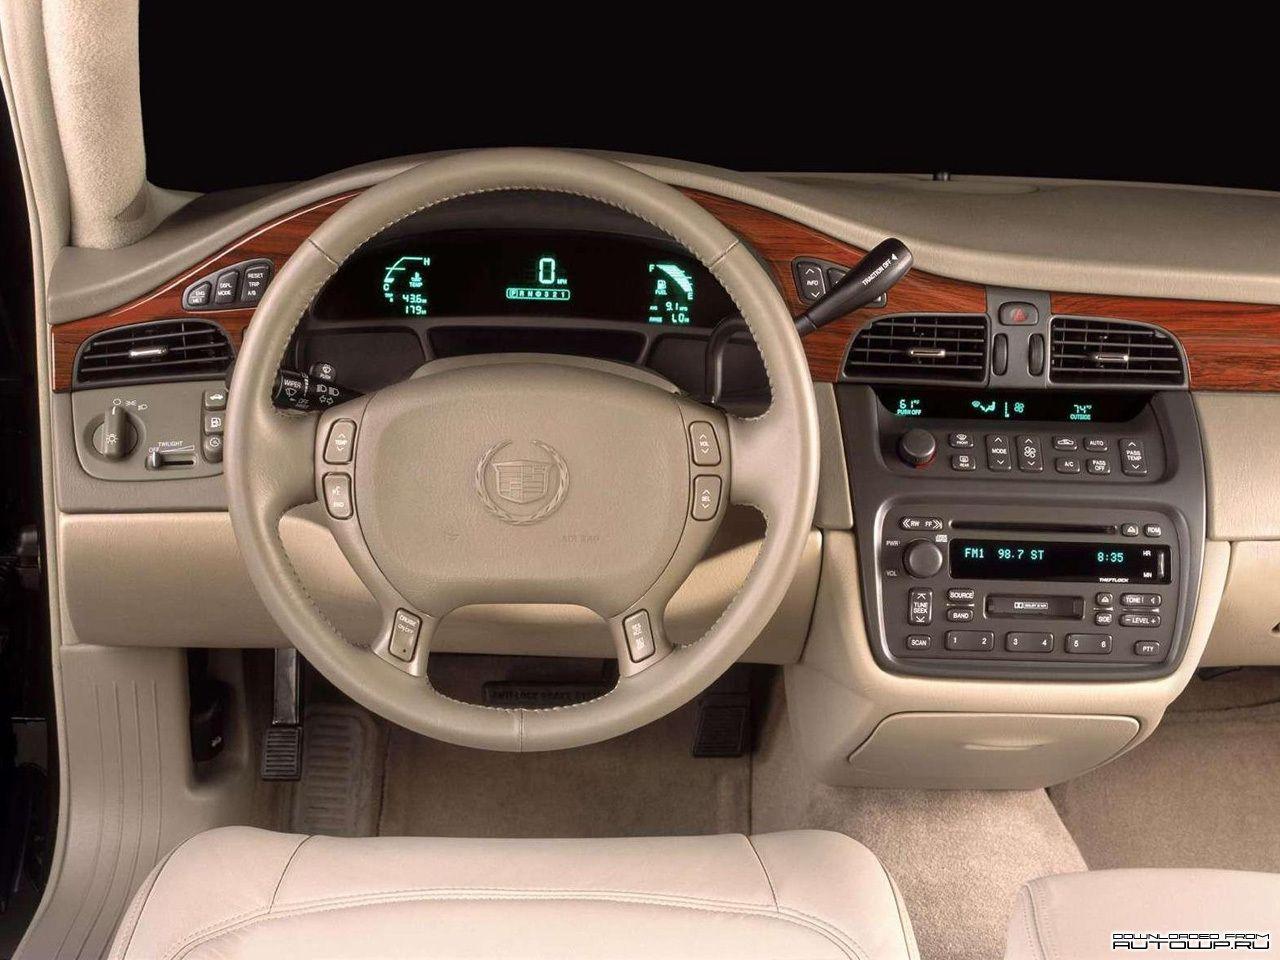 2004 Cadillac Deville | Cadillac | Pinterest | Cadillac and Cars